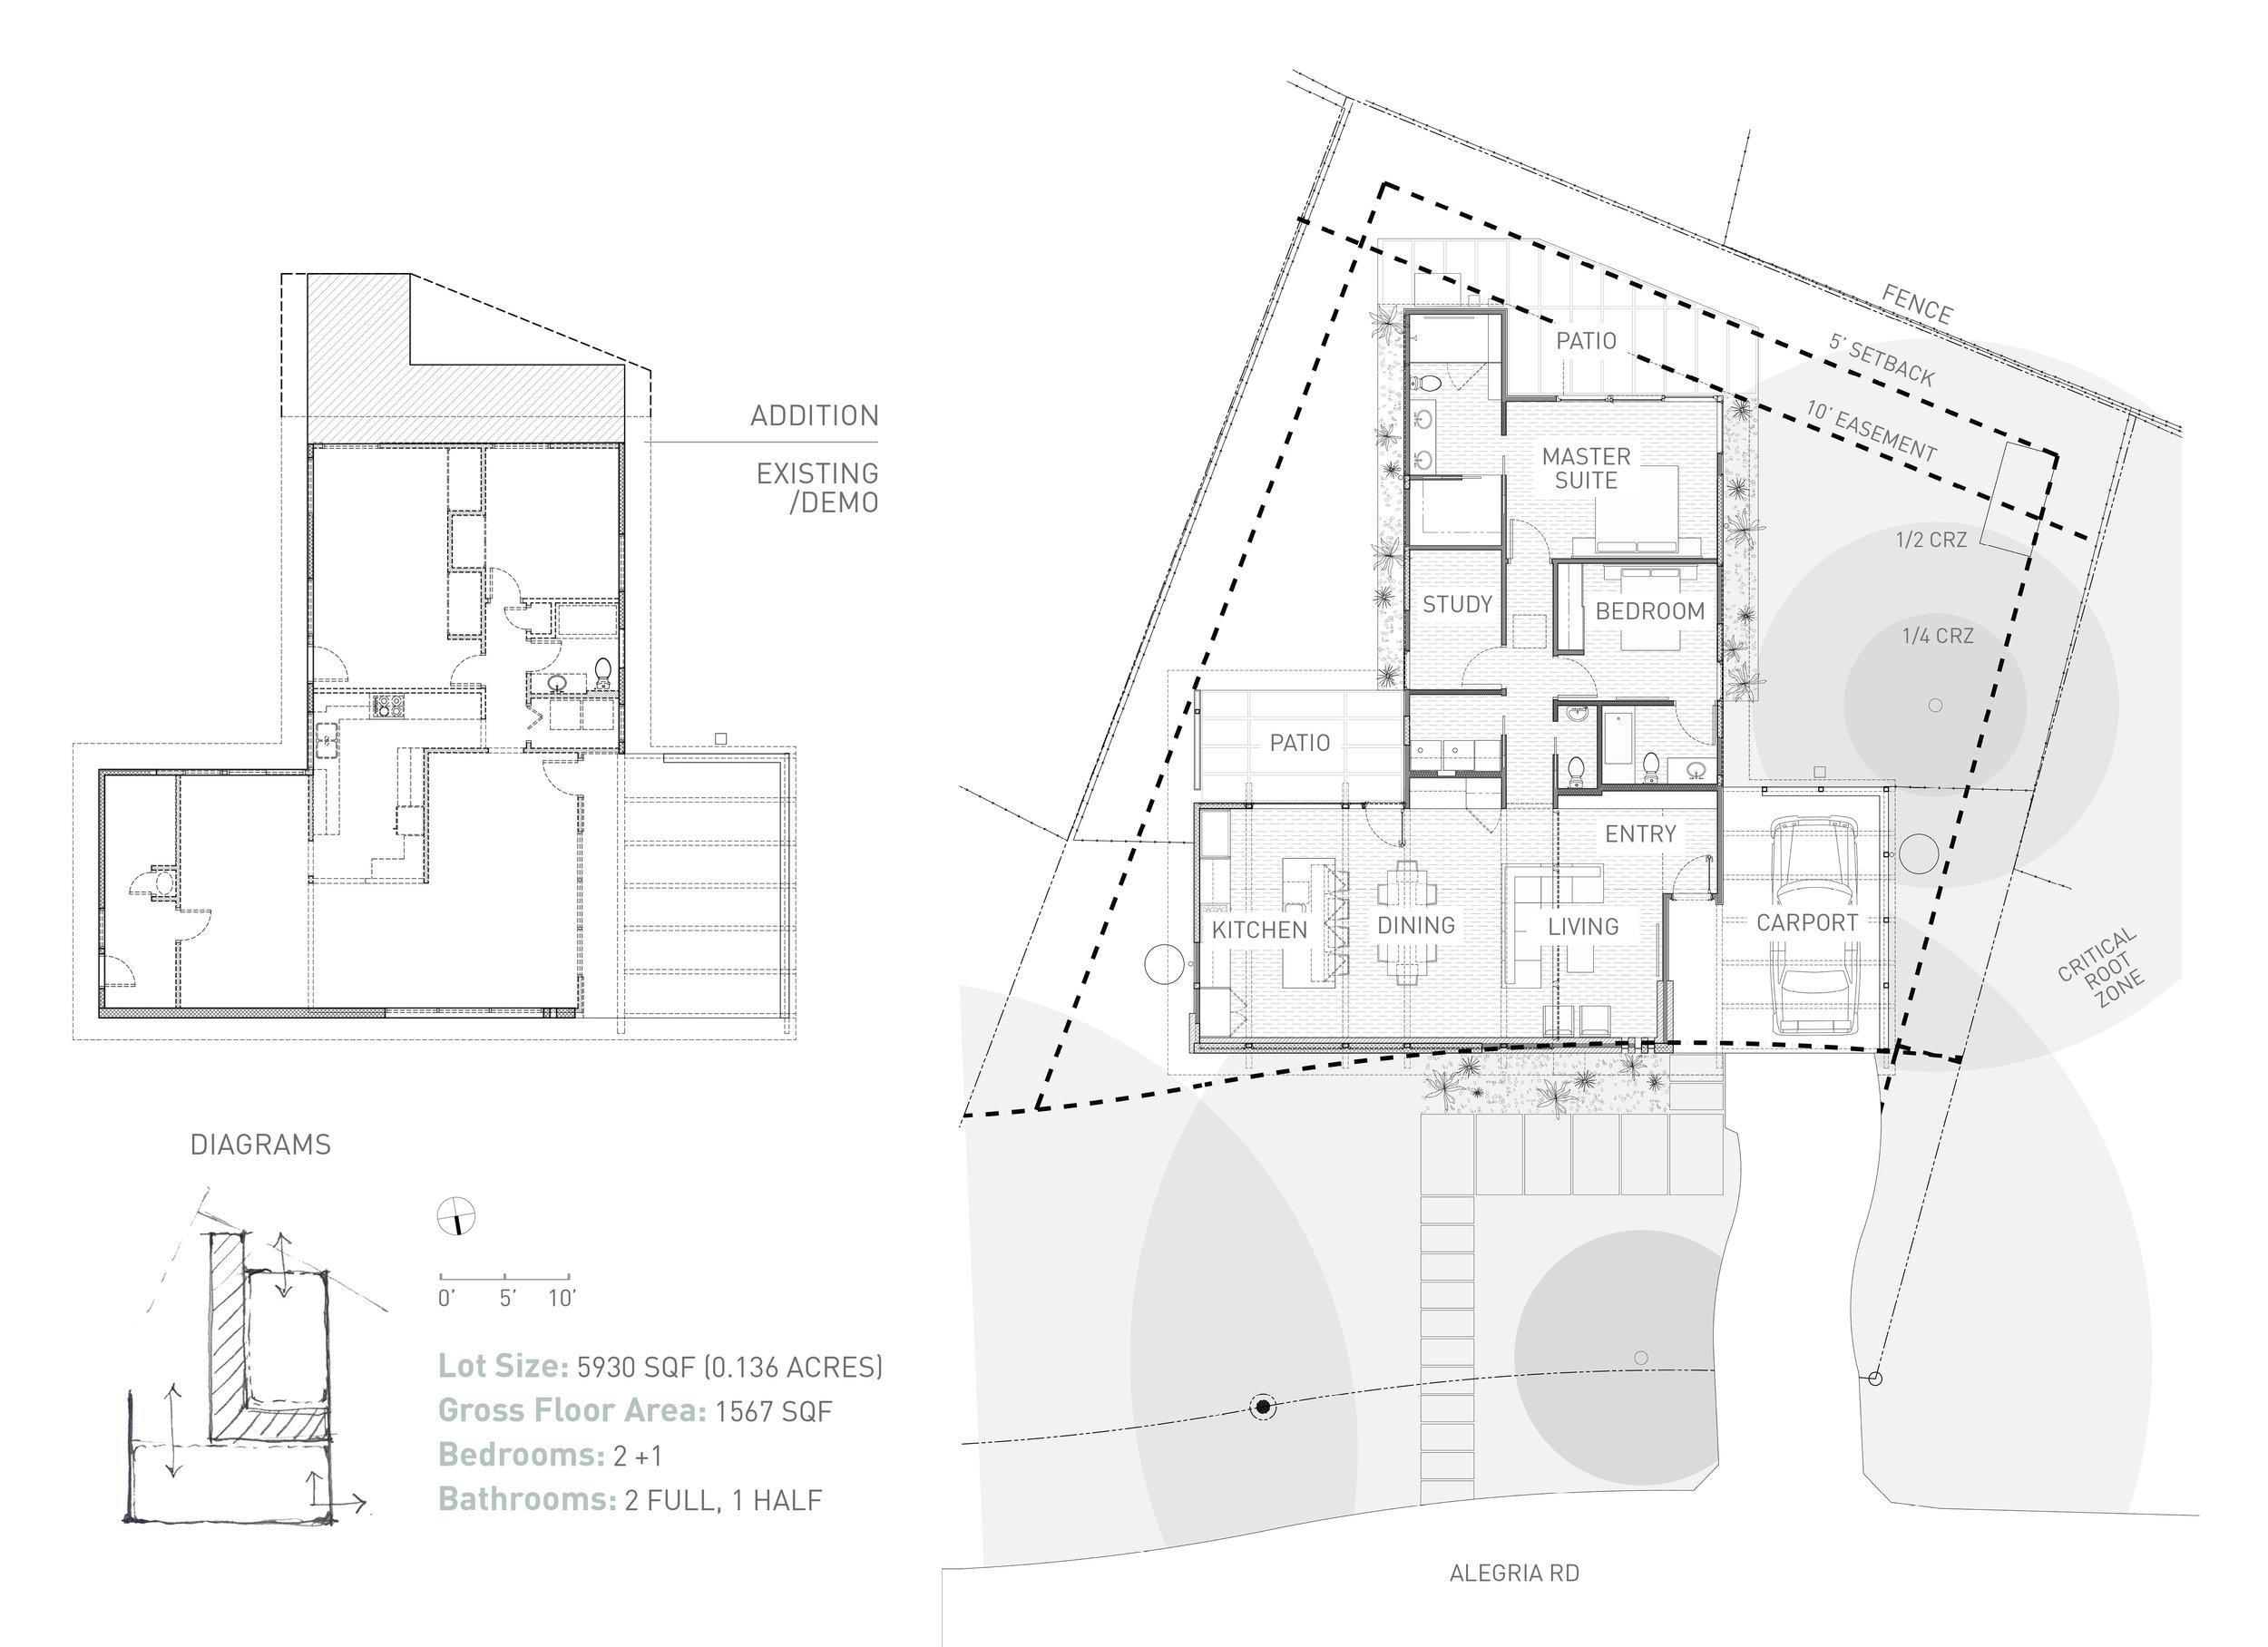 Re-Open House by Matt Fajkus Architecture - PLANS.jpg